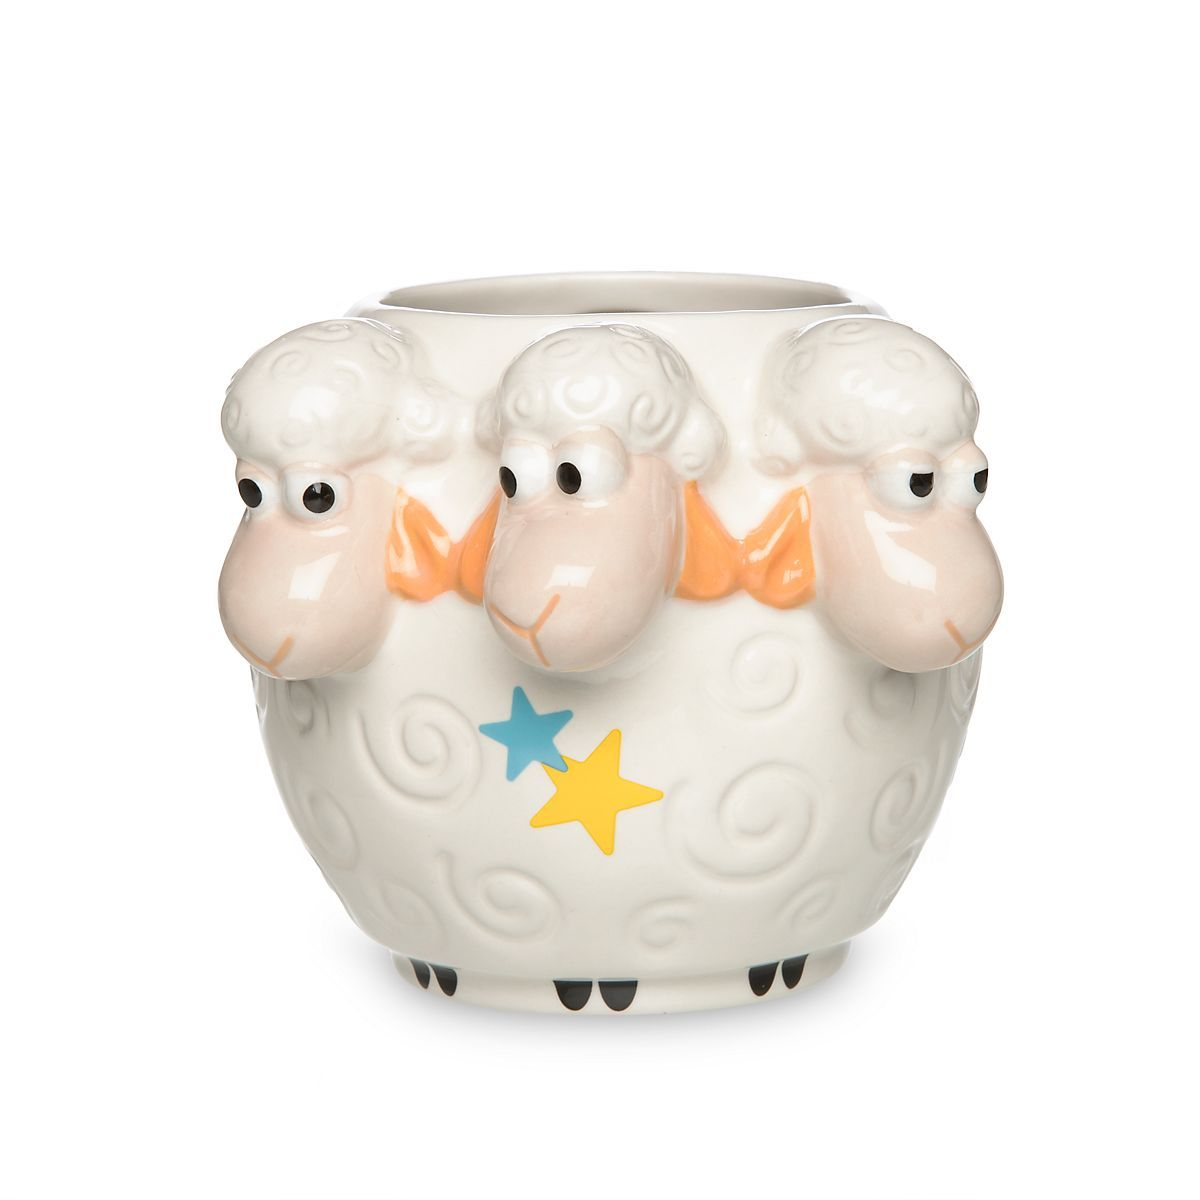 Bo Peep | Toys, Figures, Costumes & Sets | Toy Story | shopDisney